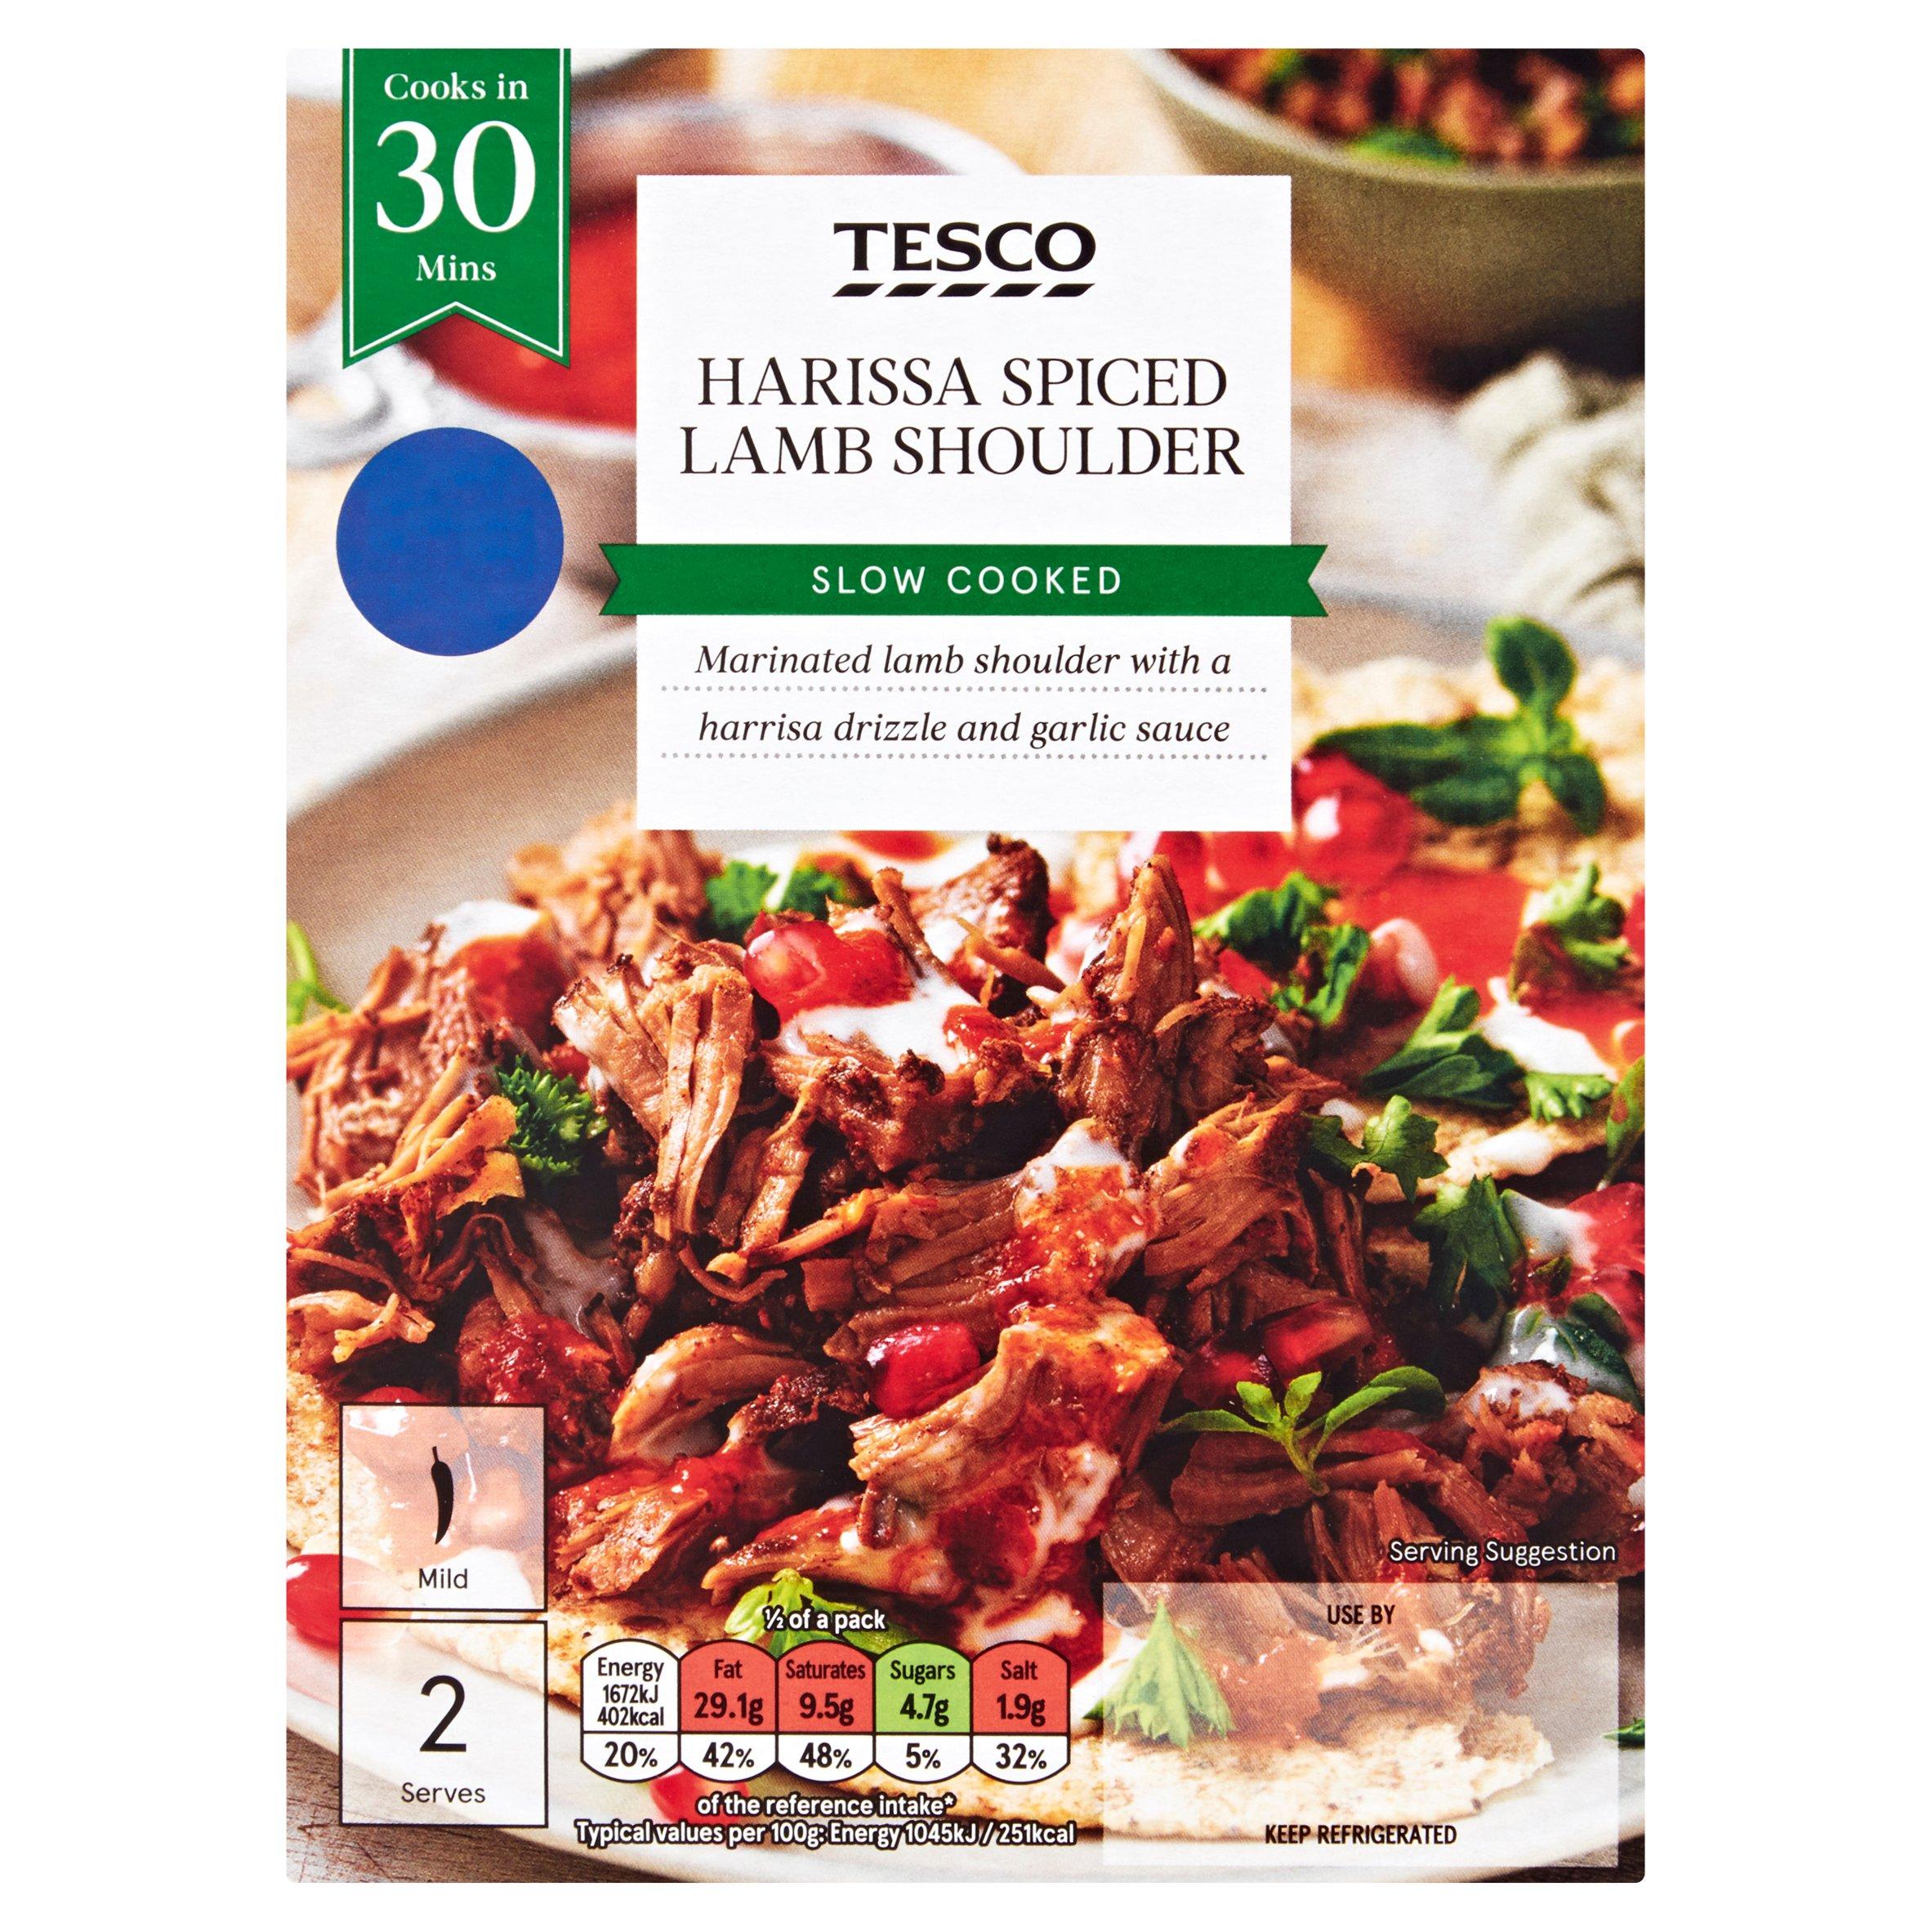 Tesco Harissa Spiced Lamb Shoulder 400G